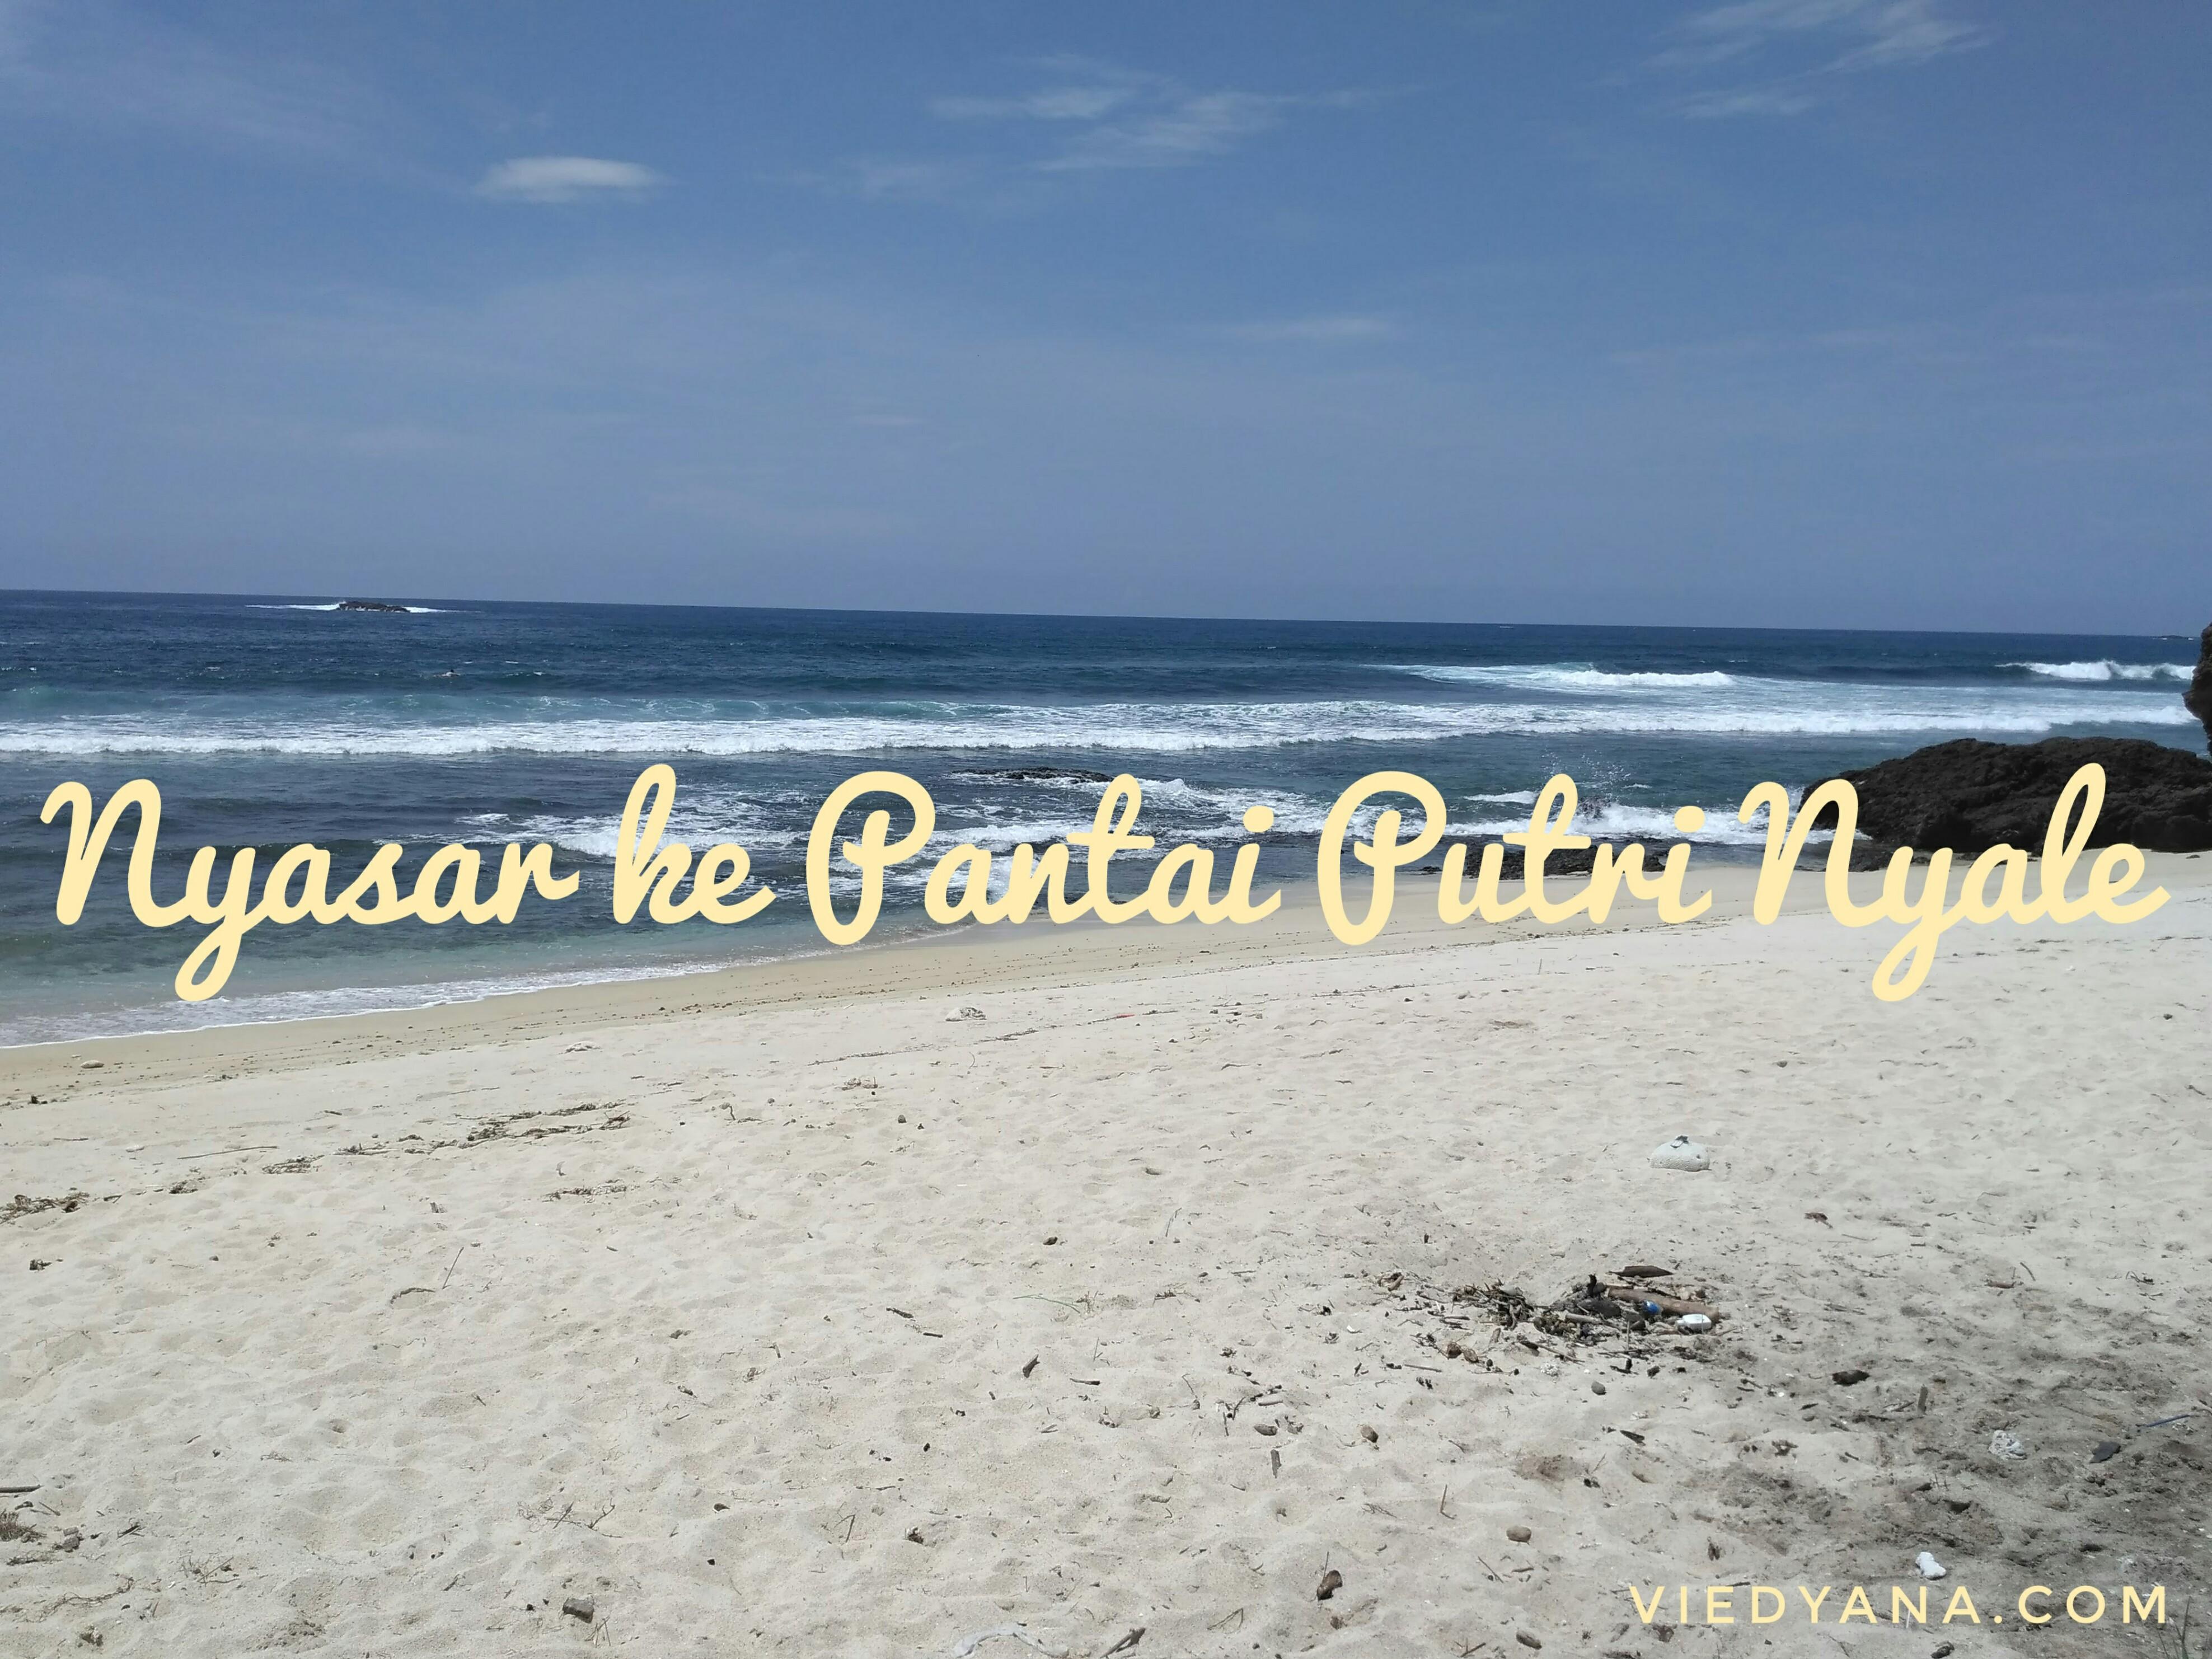 Nyasar ke Pantai Putri Nyale